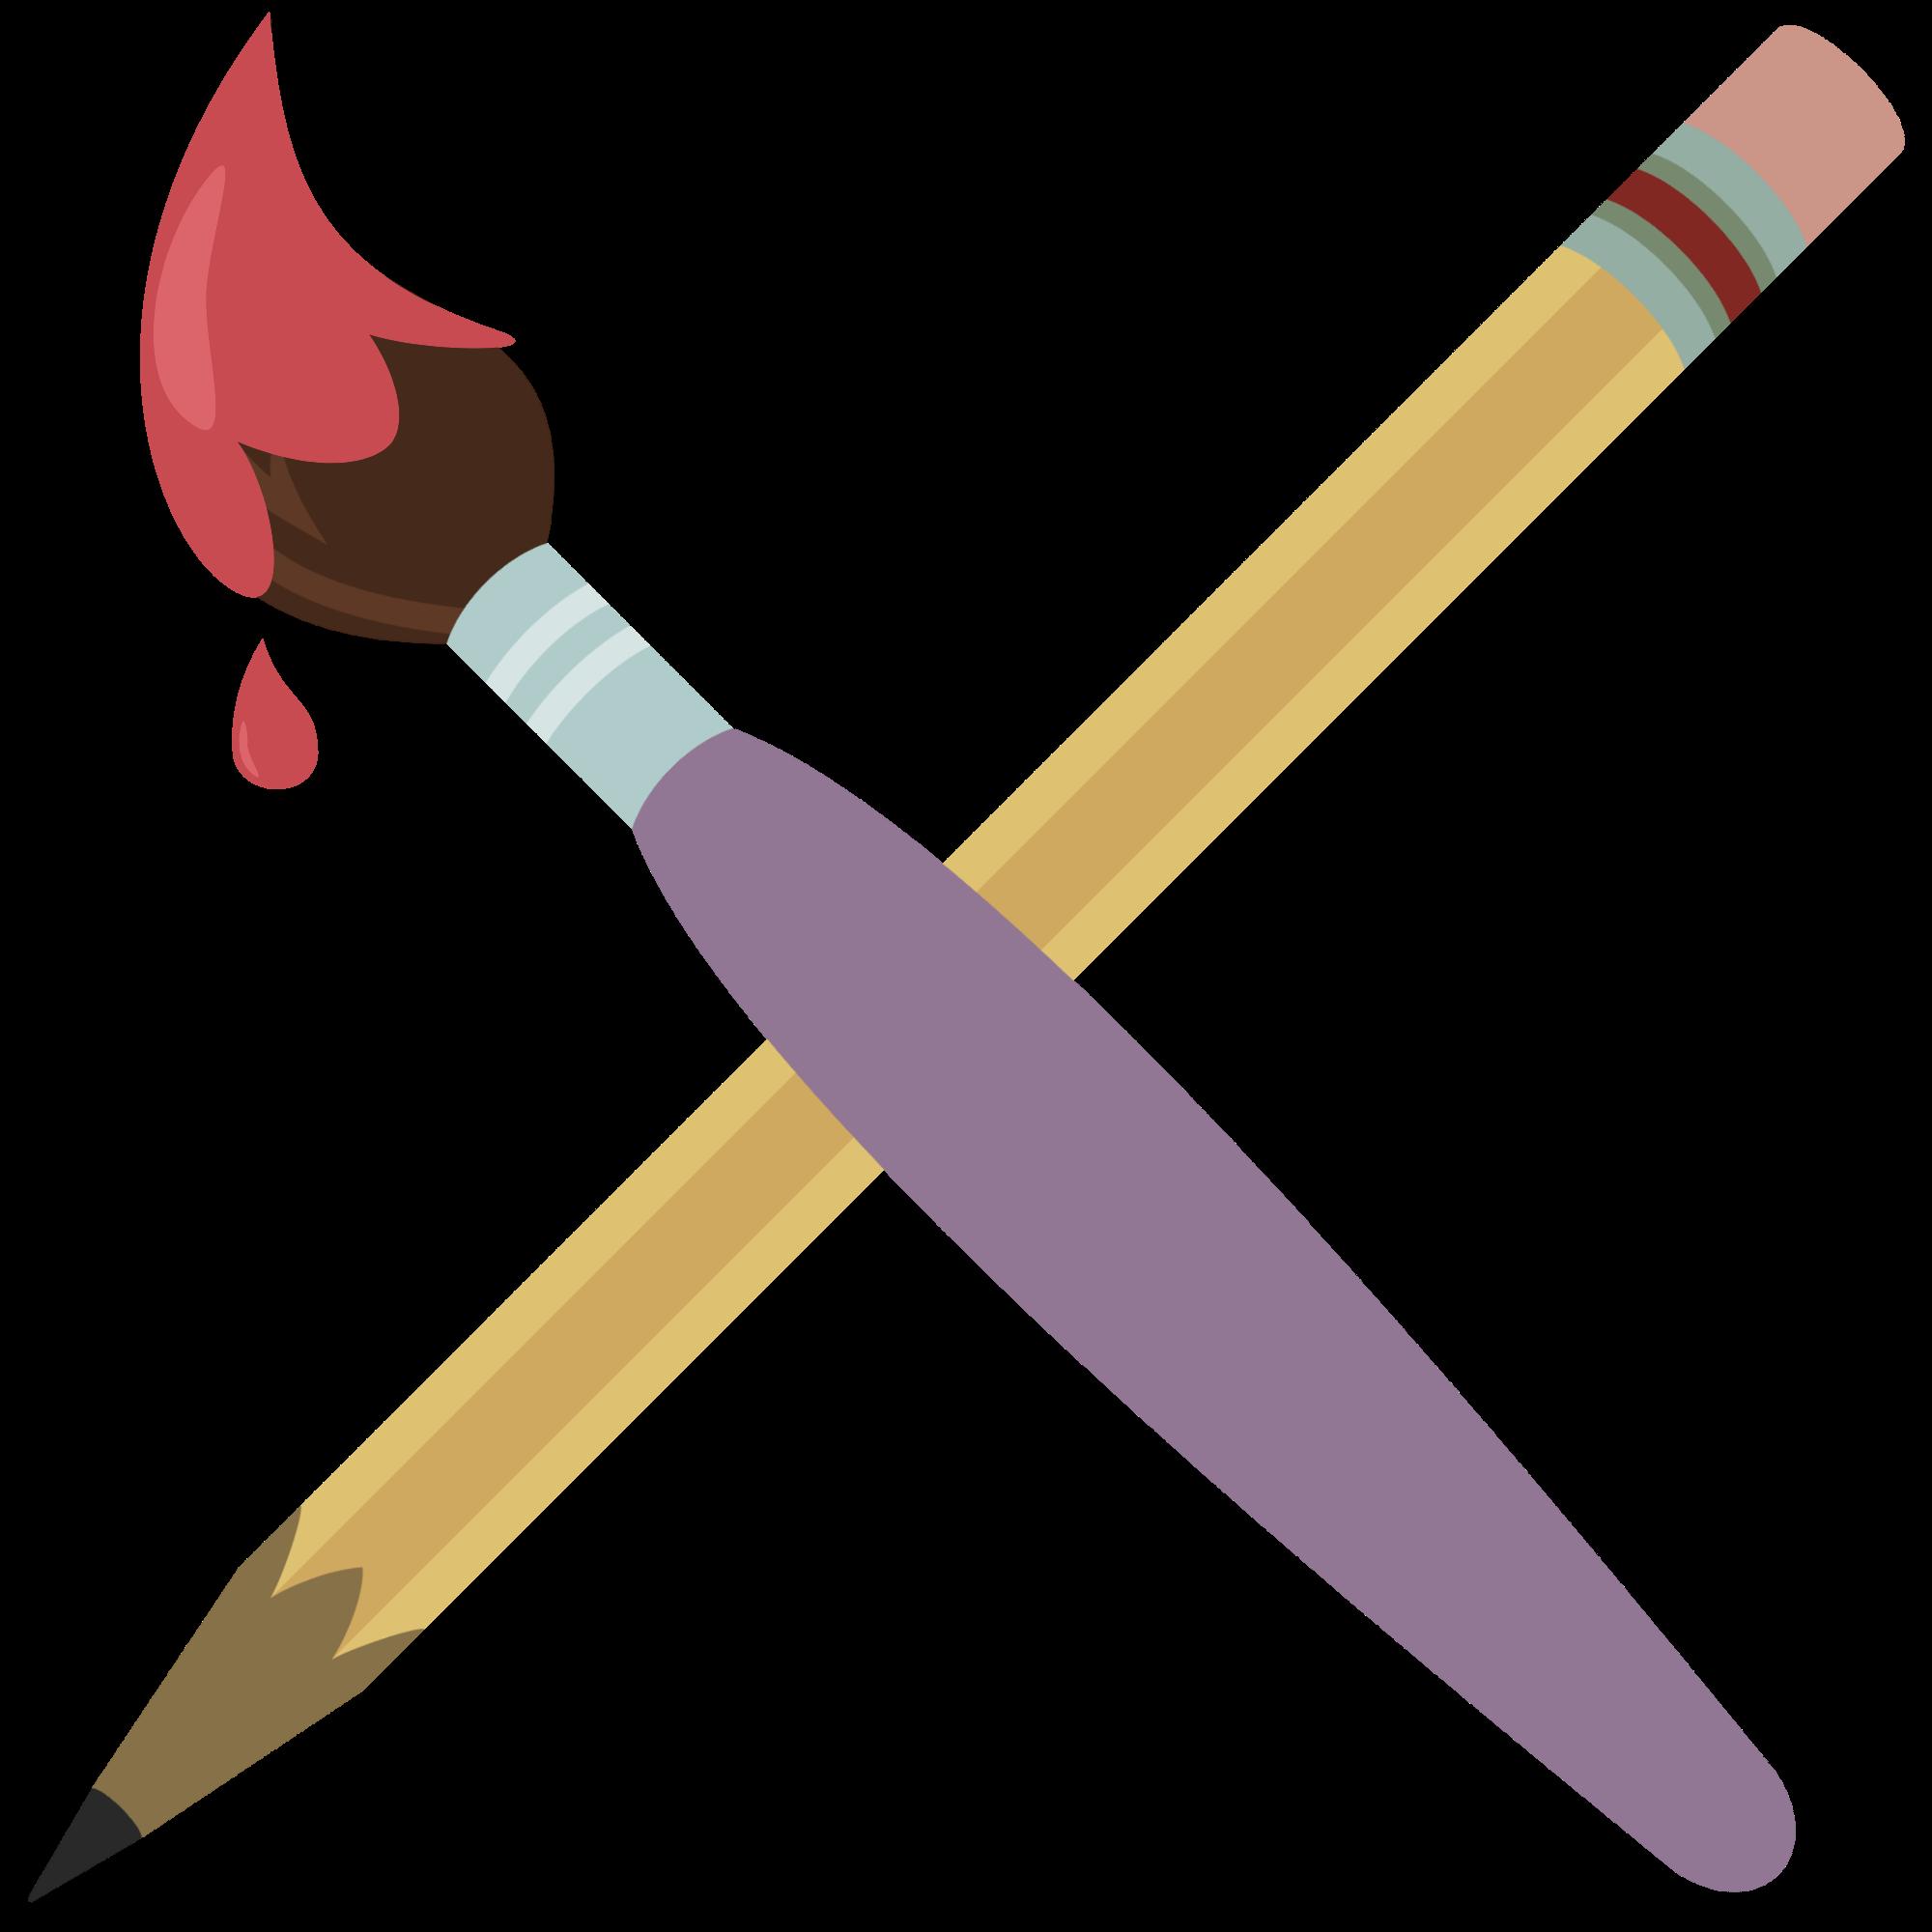 Paintbrush clipart 3 pencil. Images of cutie mark